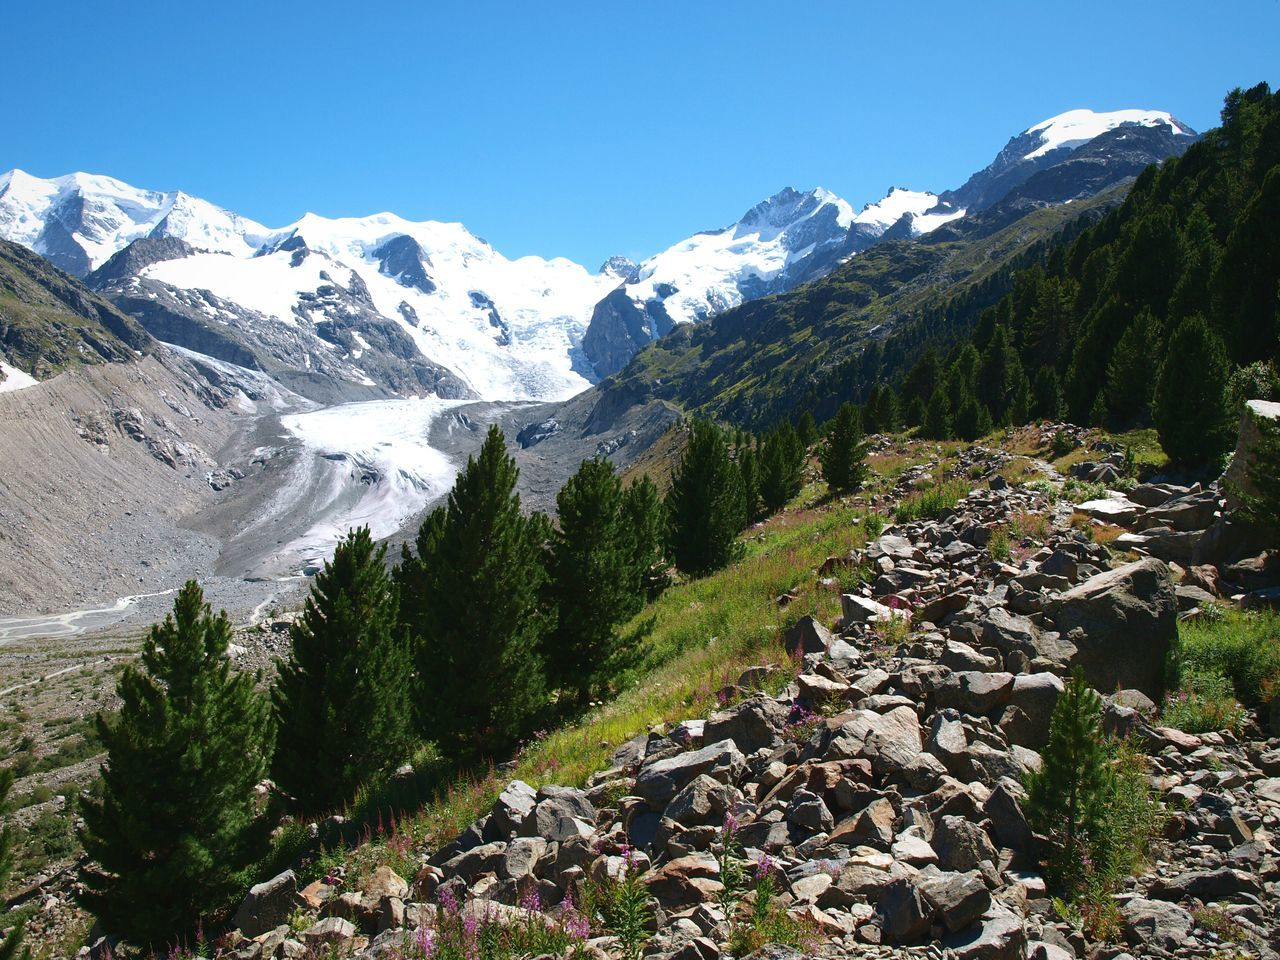 Piz Bernina Swiss Alps Morteratsch Glacier Walk